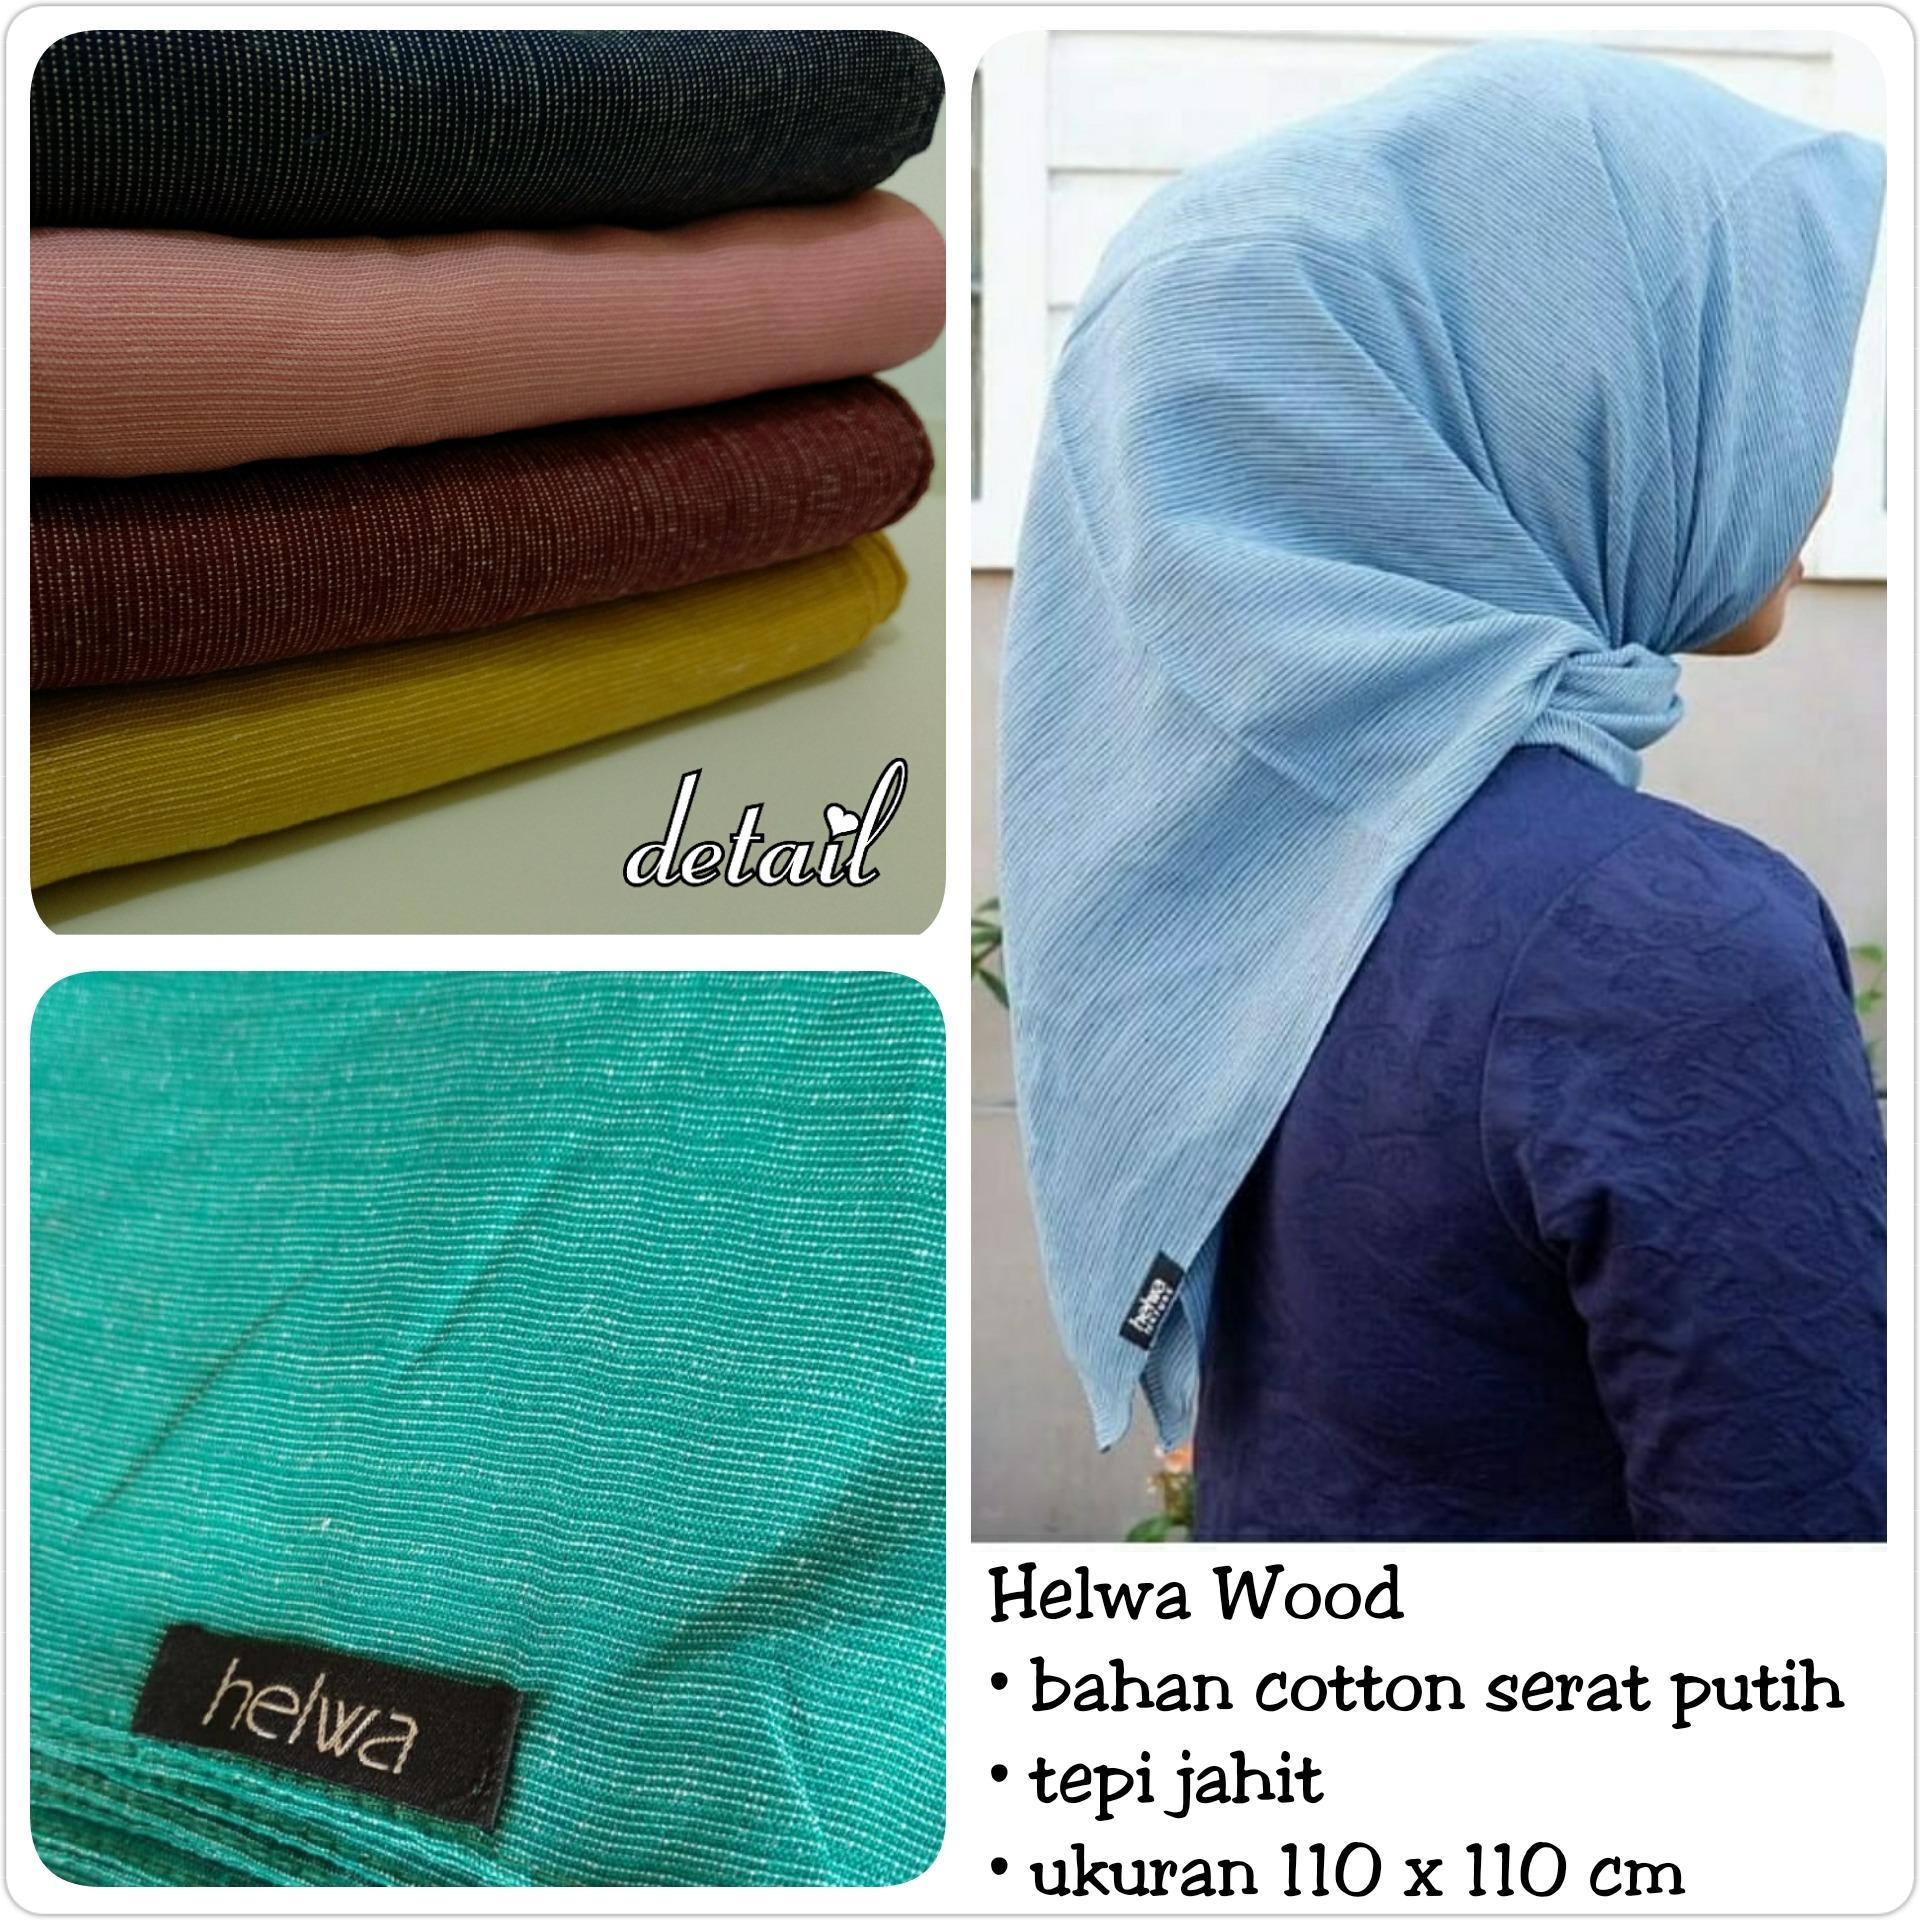 Jilbab Segi Empat Satin Kerudung Hijab Wood Daftar Harga Terkini Shafeeya Damia Light Orange Isi 3 Pcs Segiempat Helwa Texture Ansania Lovilla Shinar Glamour